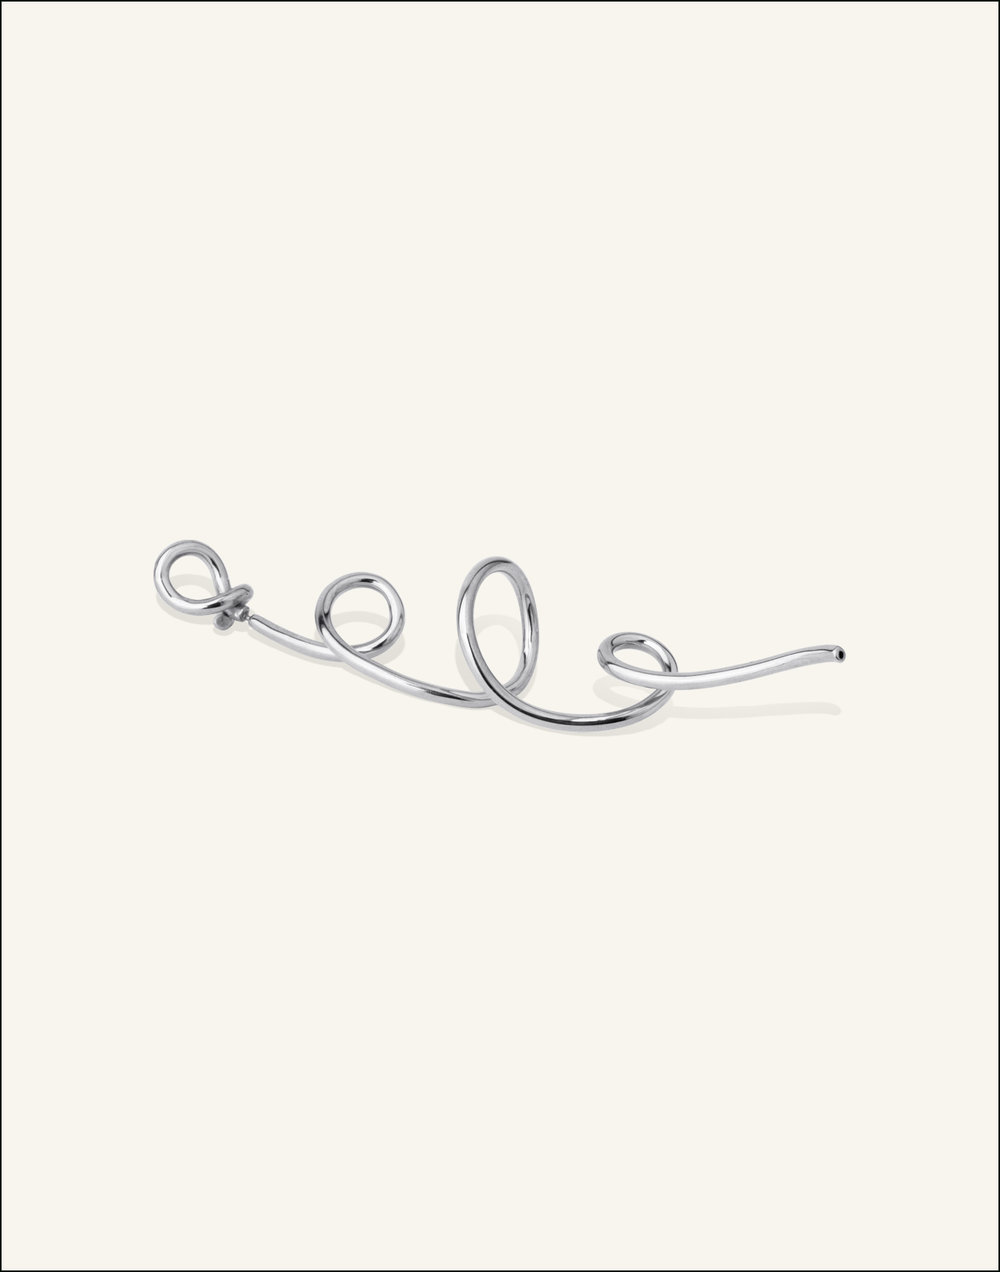 Completedworks-Silver-Earrings-Self-Portrait-4-1.jpg